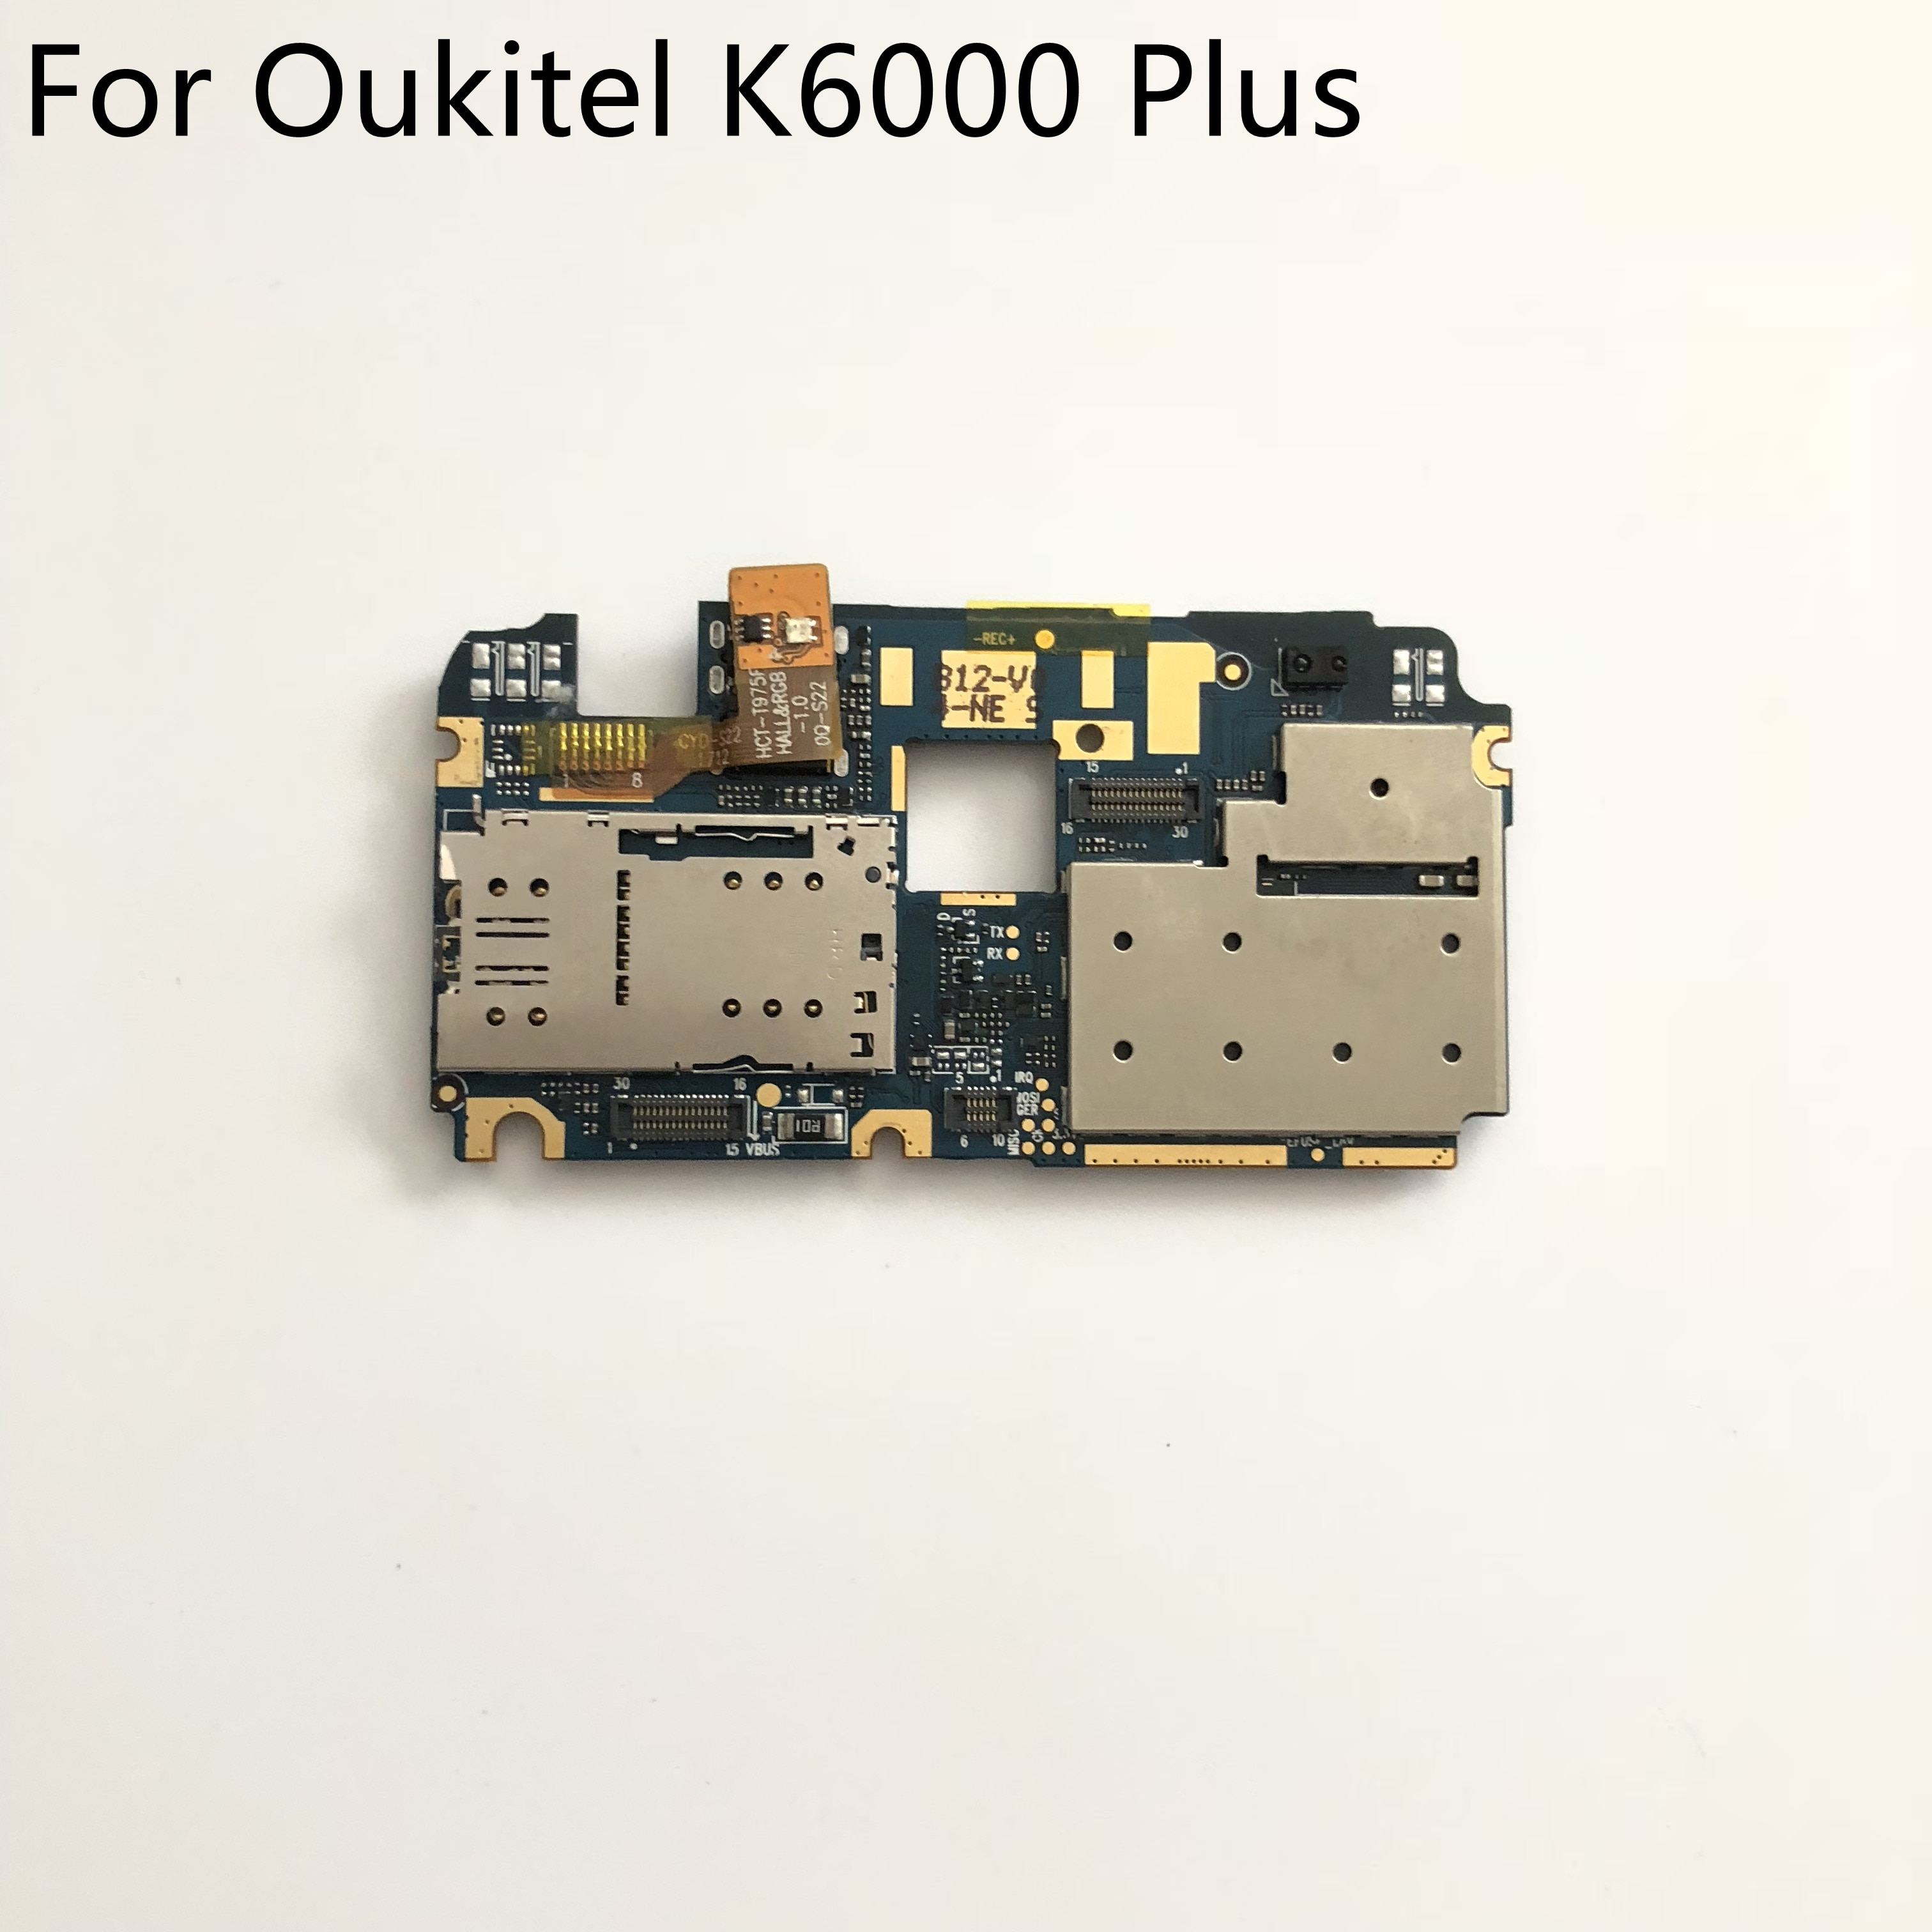 "Oukitel K6000 Além Usado 4G RAM + 64G ROM Motherboard Mainboard Para Oukitel K6000 Plus MTK6750T 5.5"" FHD 1920x1080 Do Telefone Móvel"